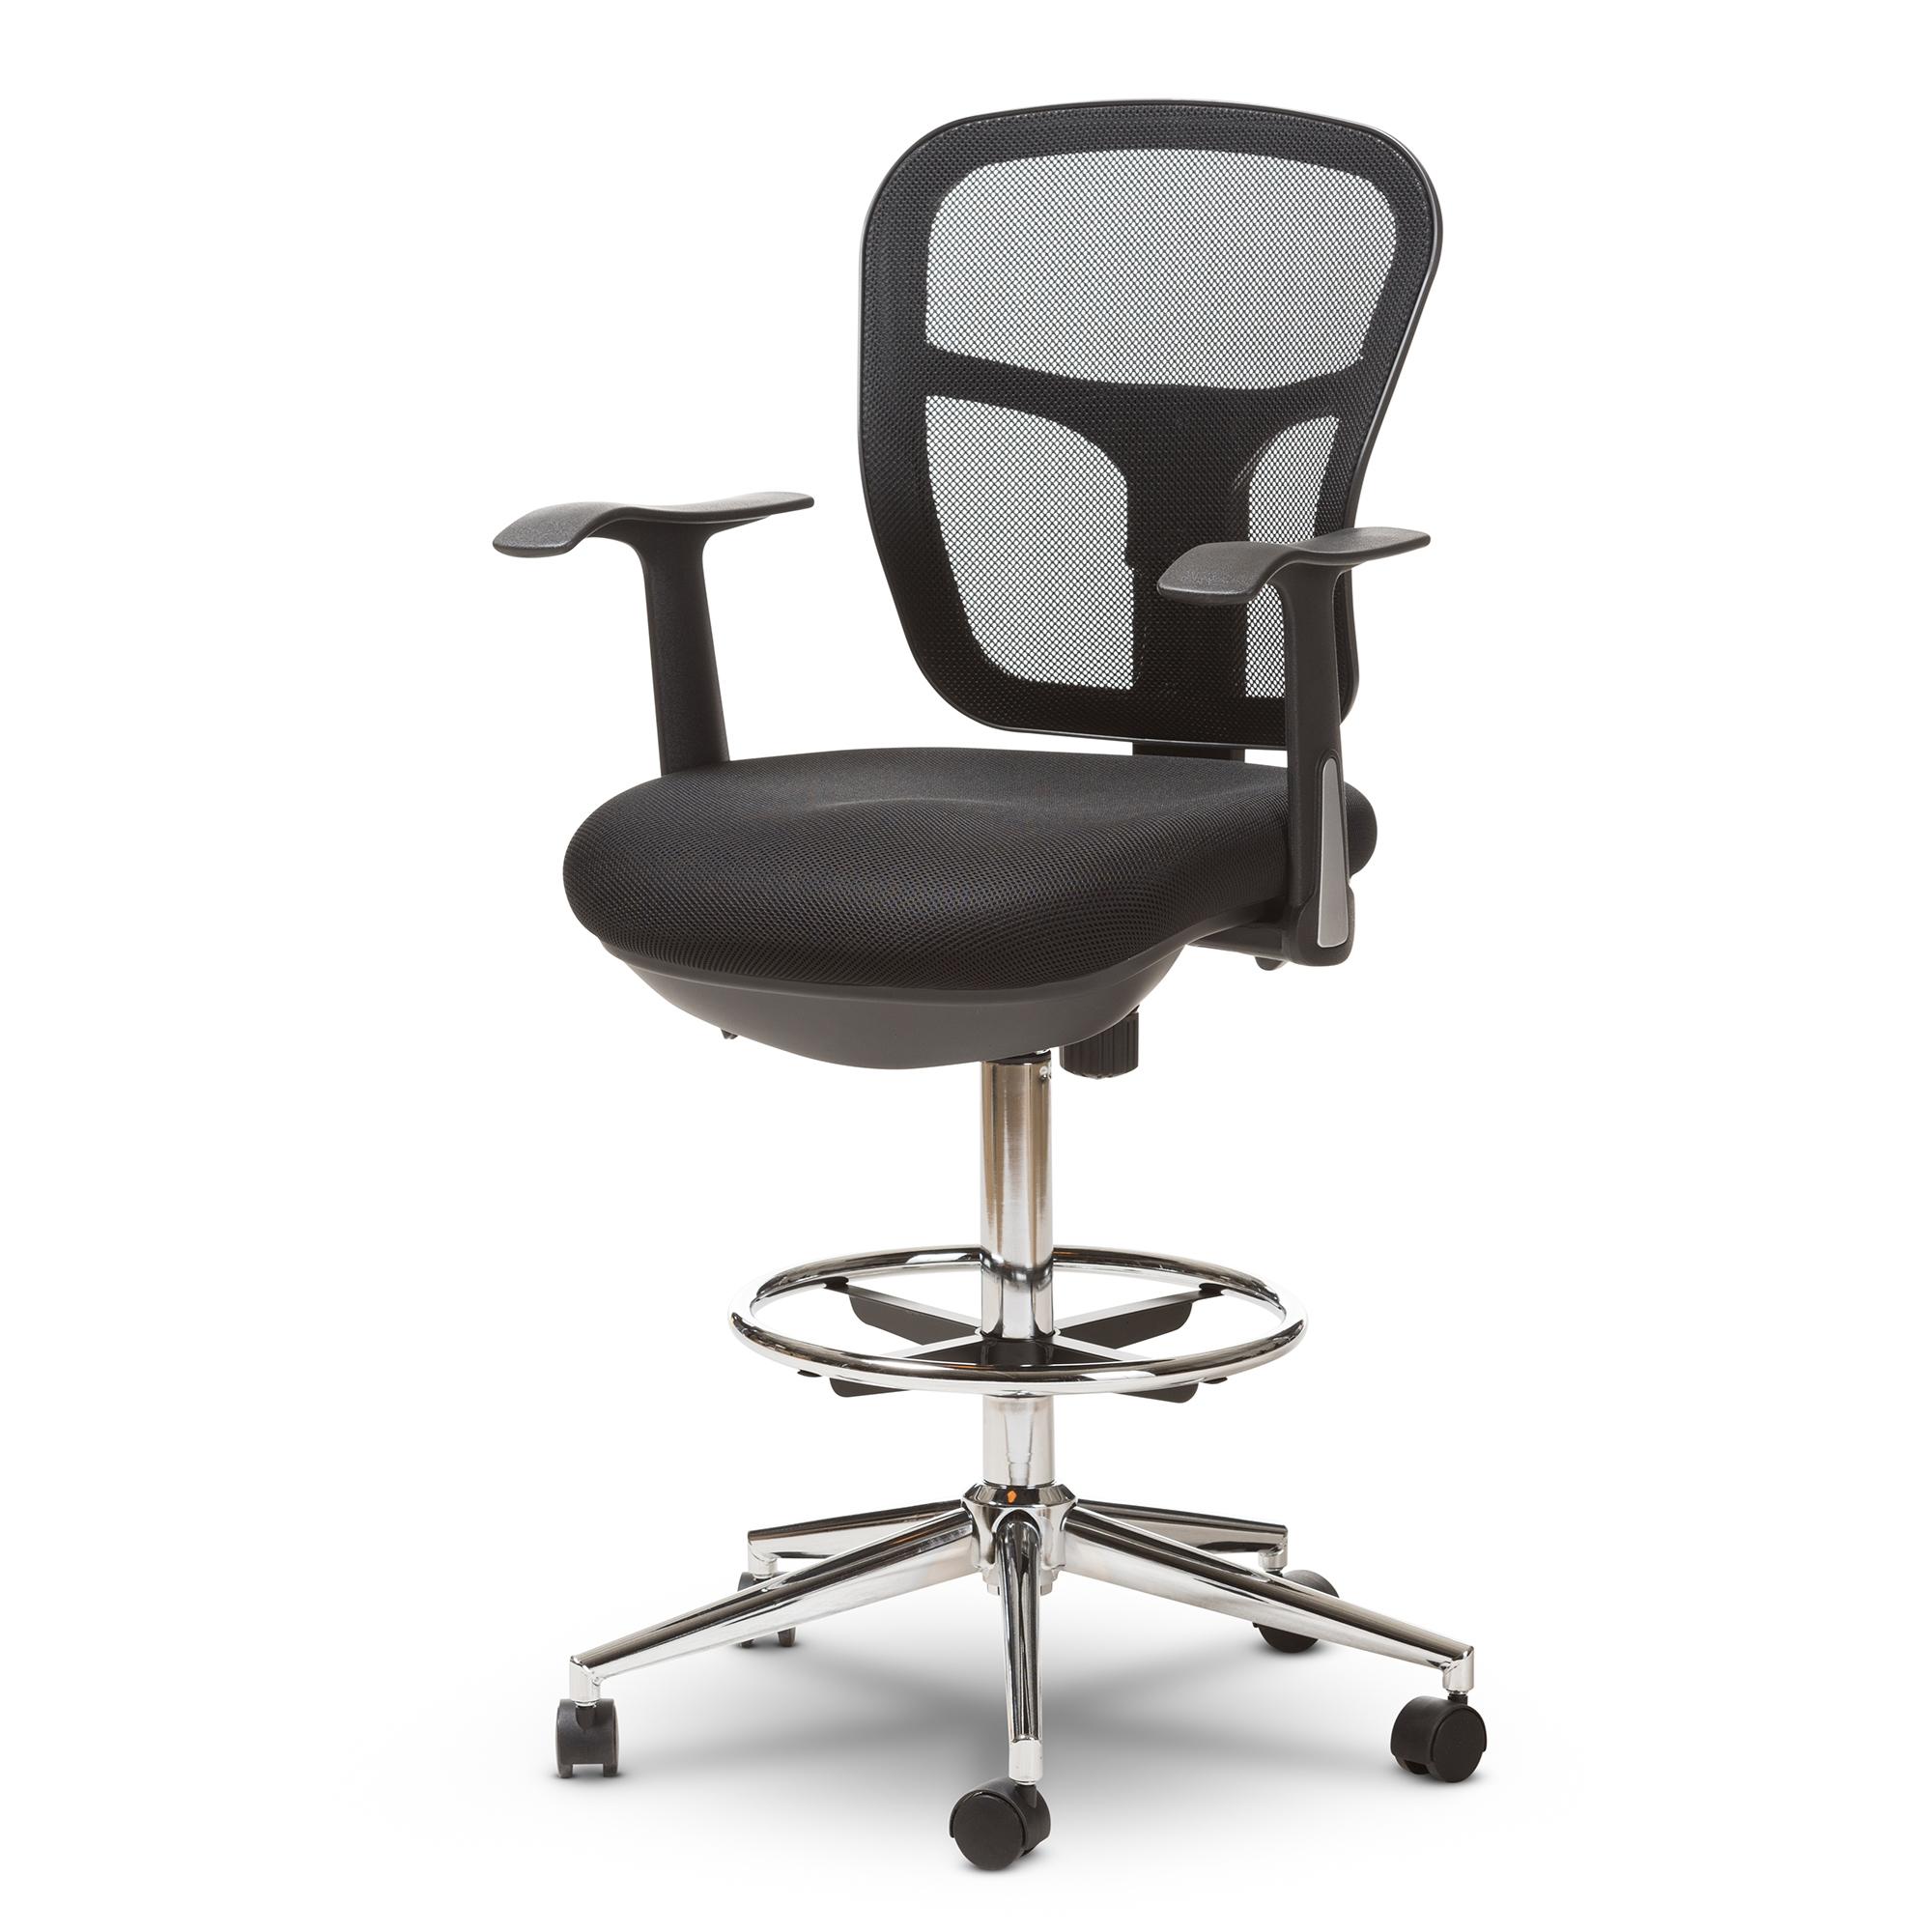 chair mesh stool bedroom swivel baxton studio landon modern and contemporary black adjustable height drafting